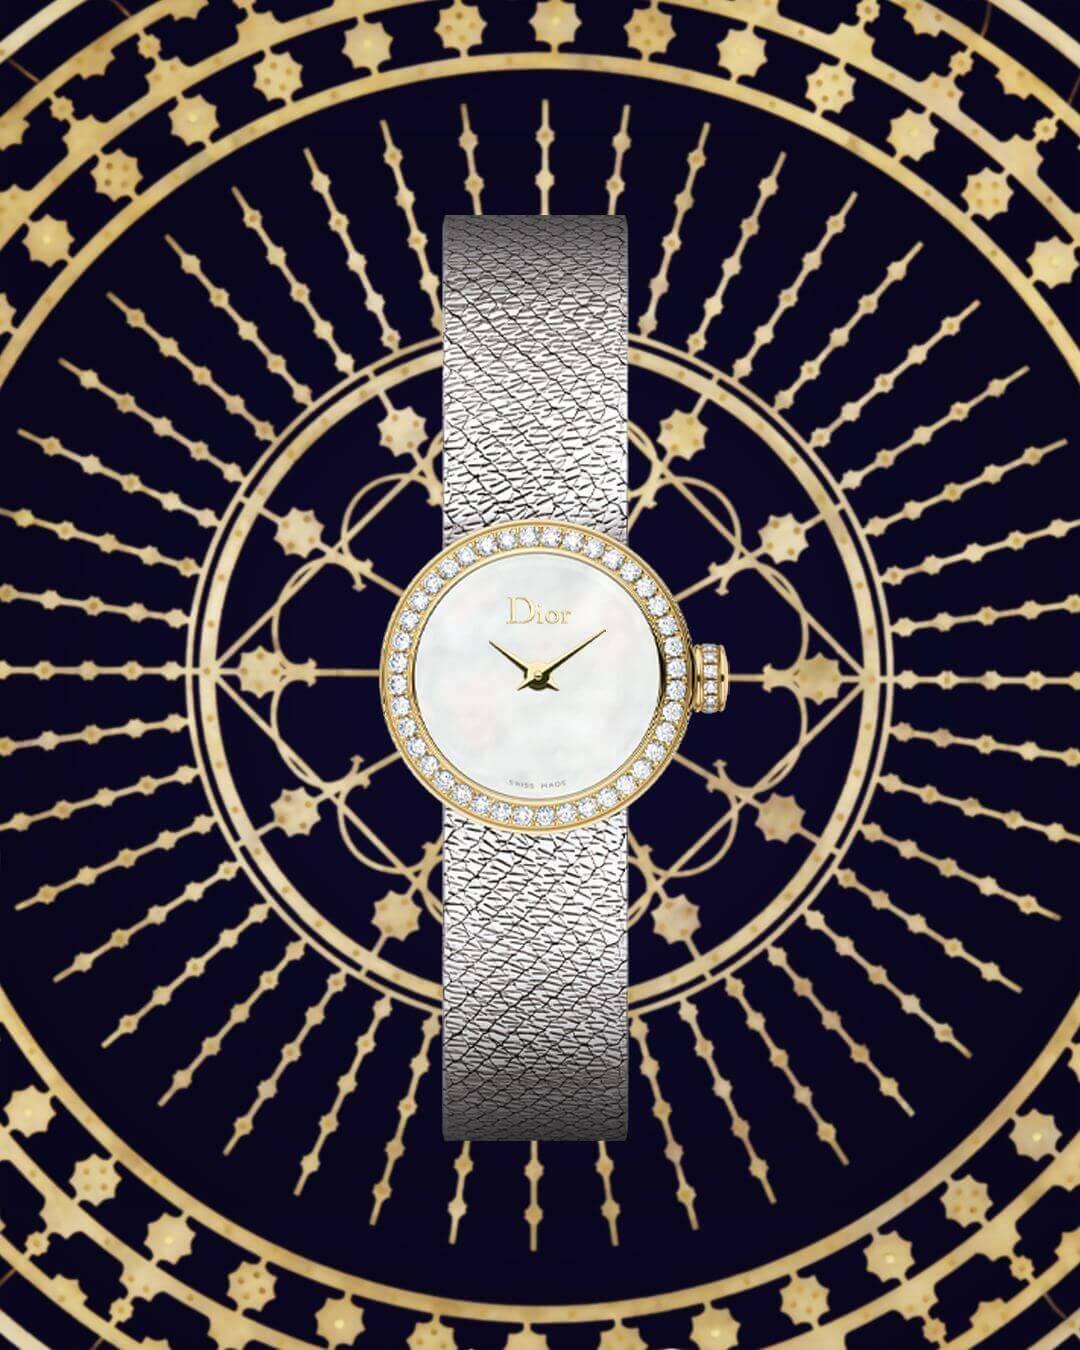 Dior Joaillerie mücevher saat